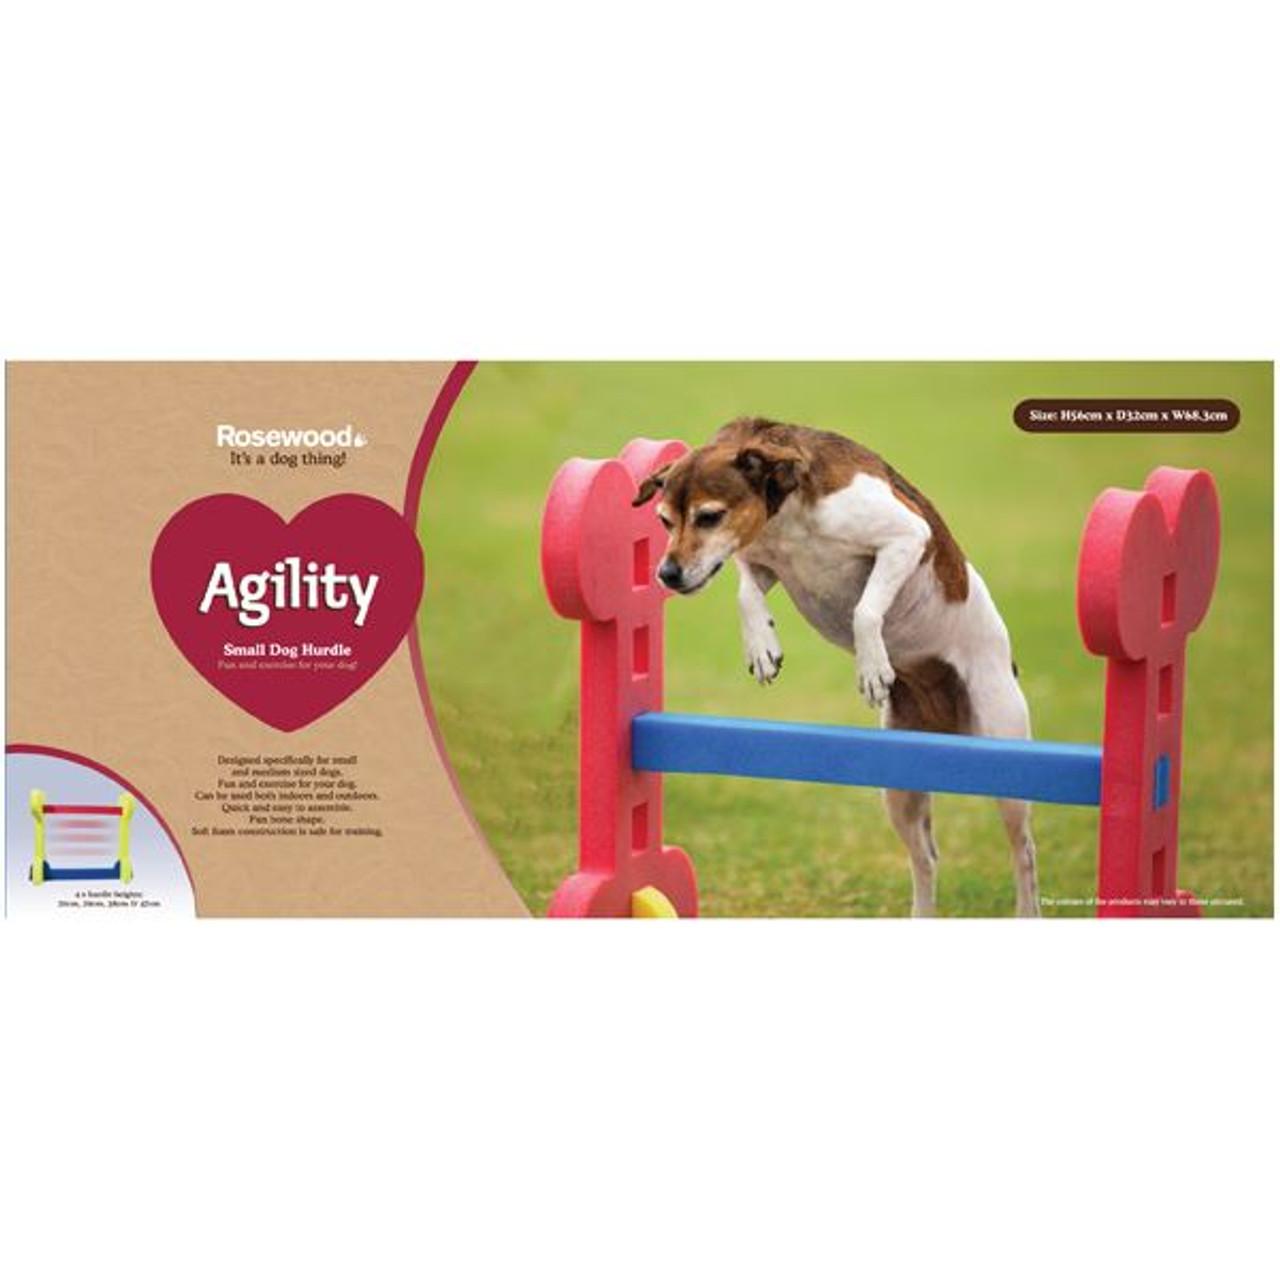 Small Dog Soft Rigid Foam Easy Assemble Agility Hurdle Fun Exercise 32x56cm